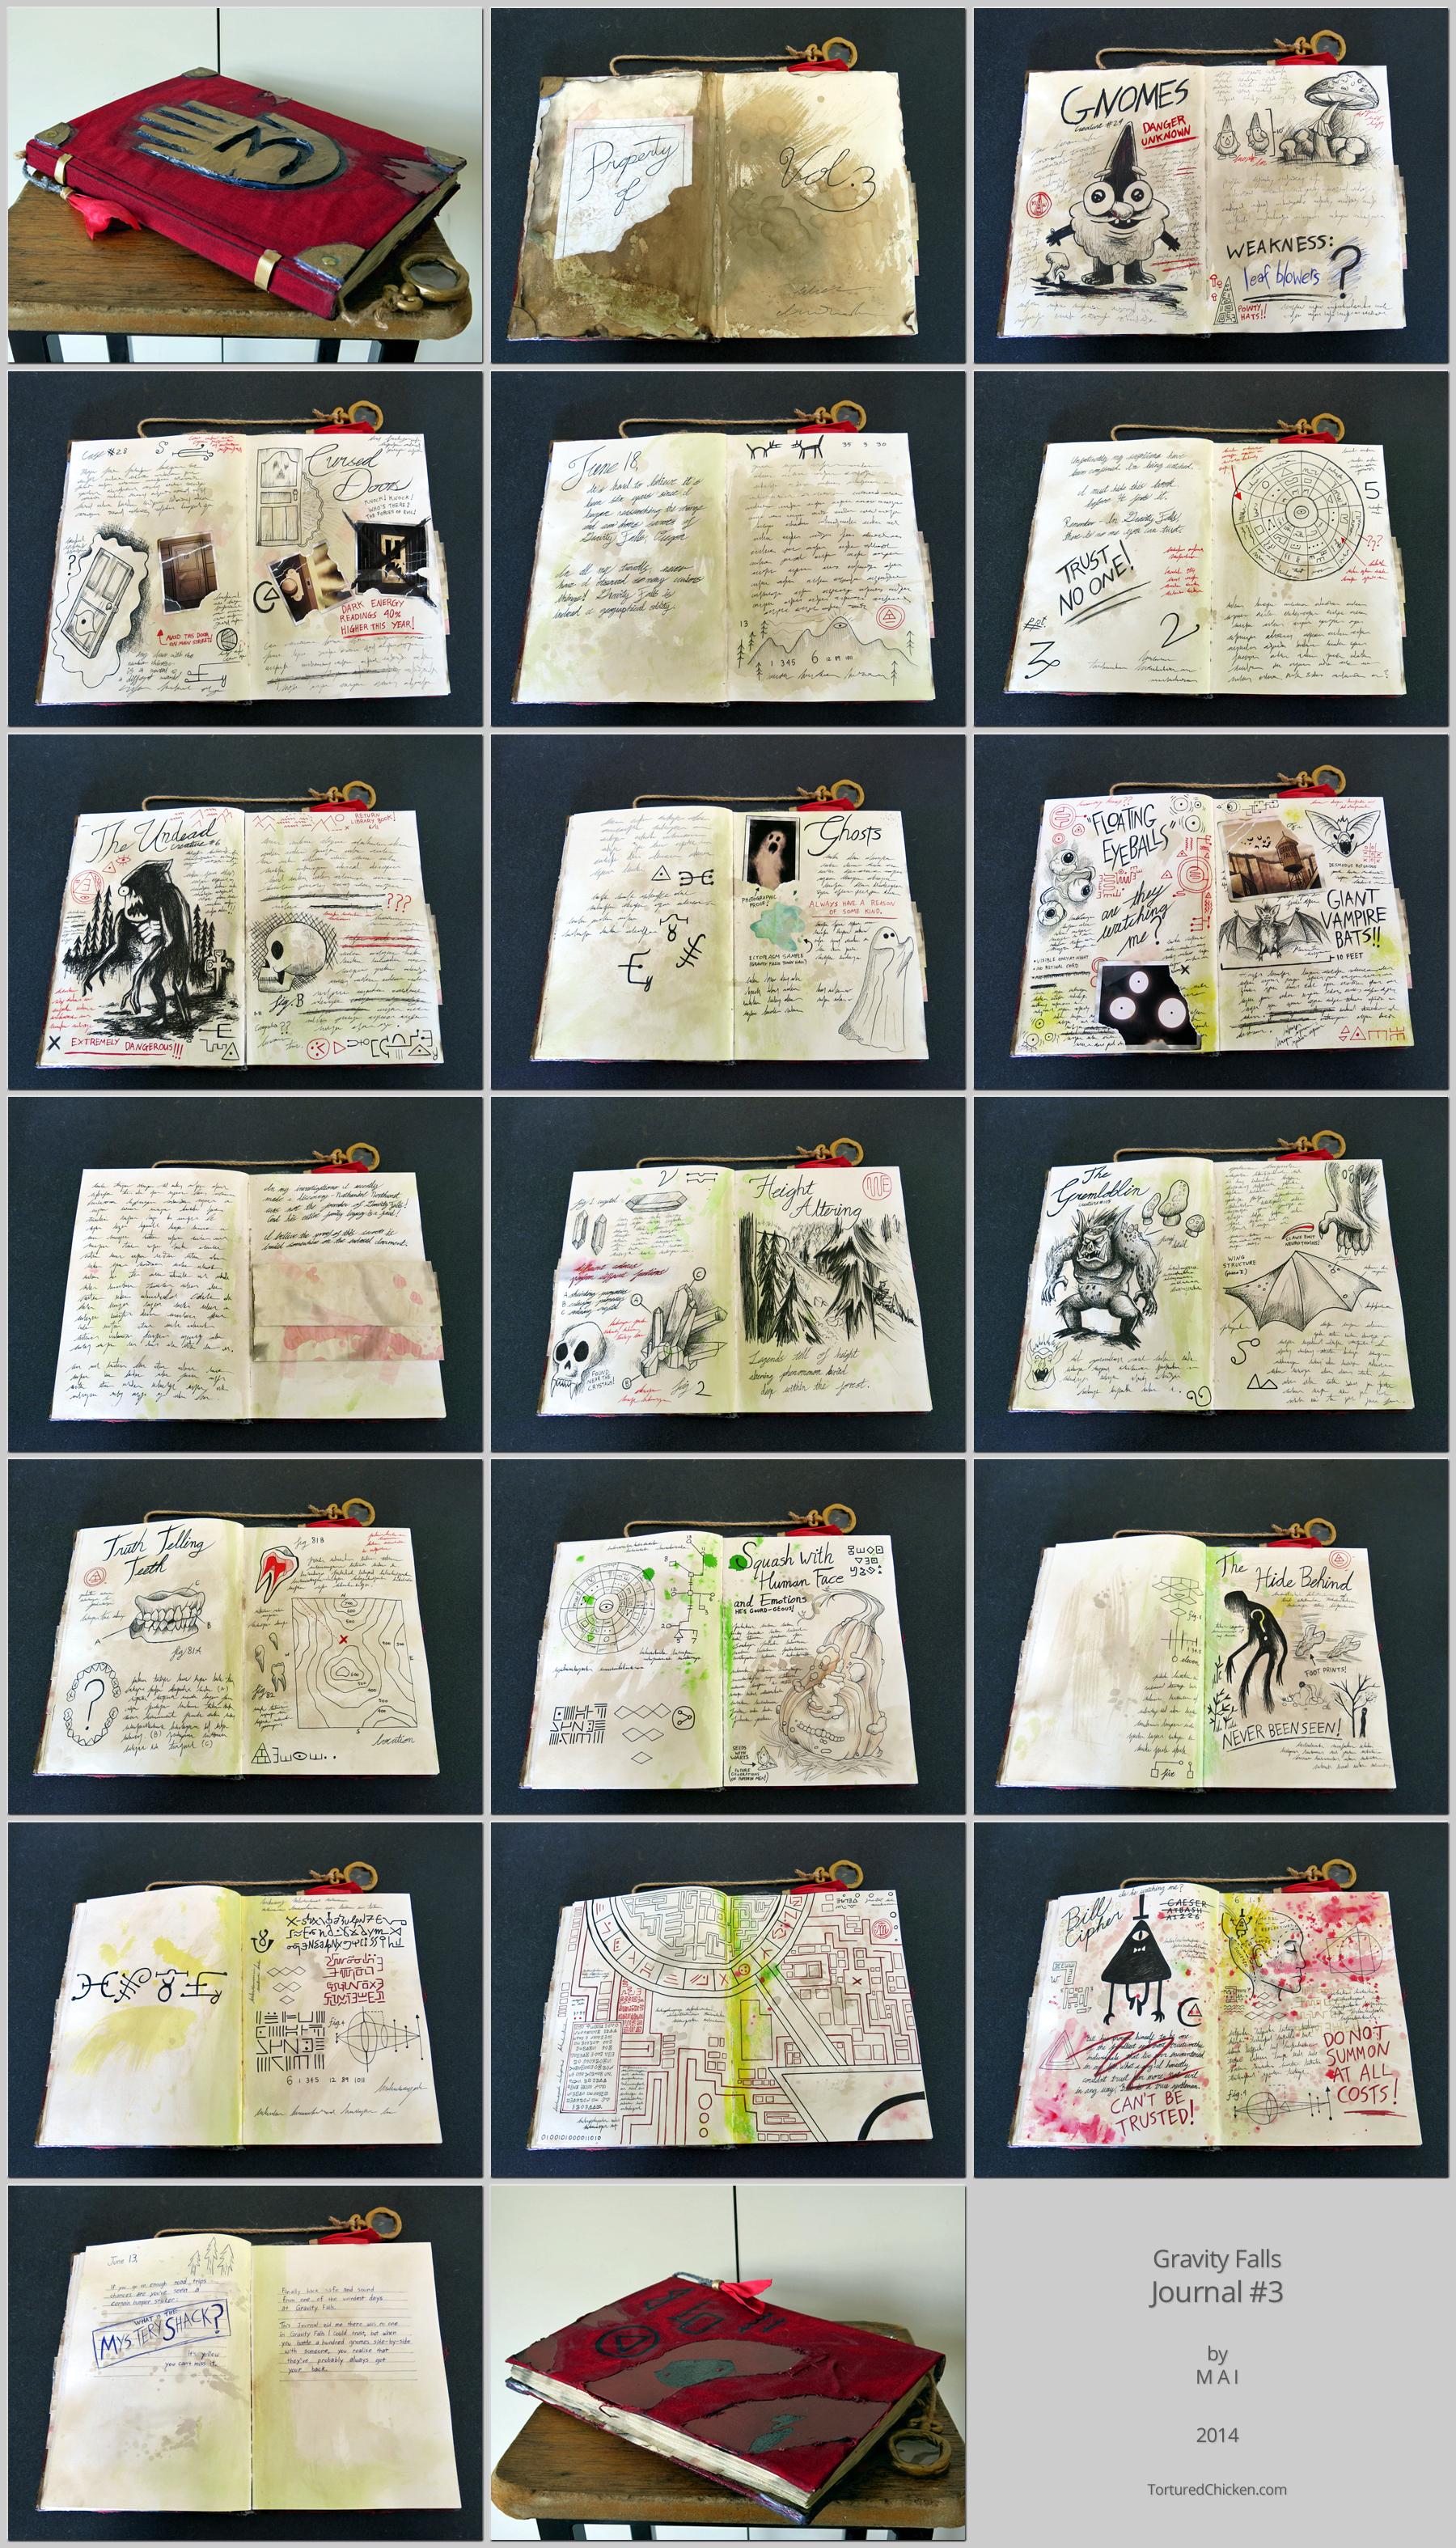 Gravity Falls, journal #3.